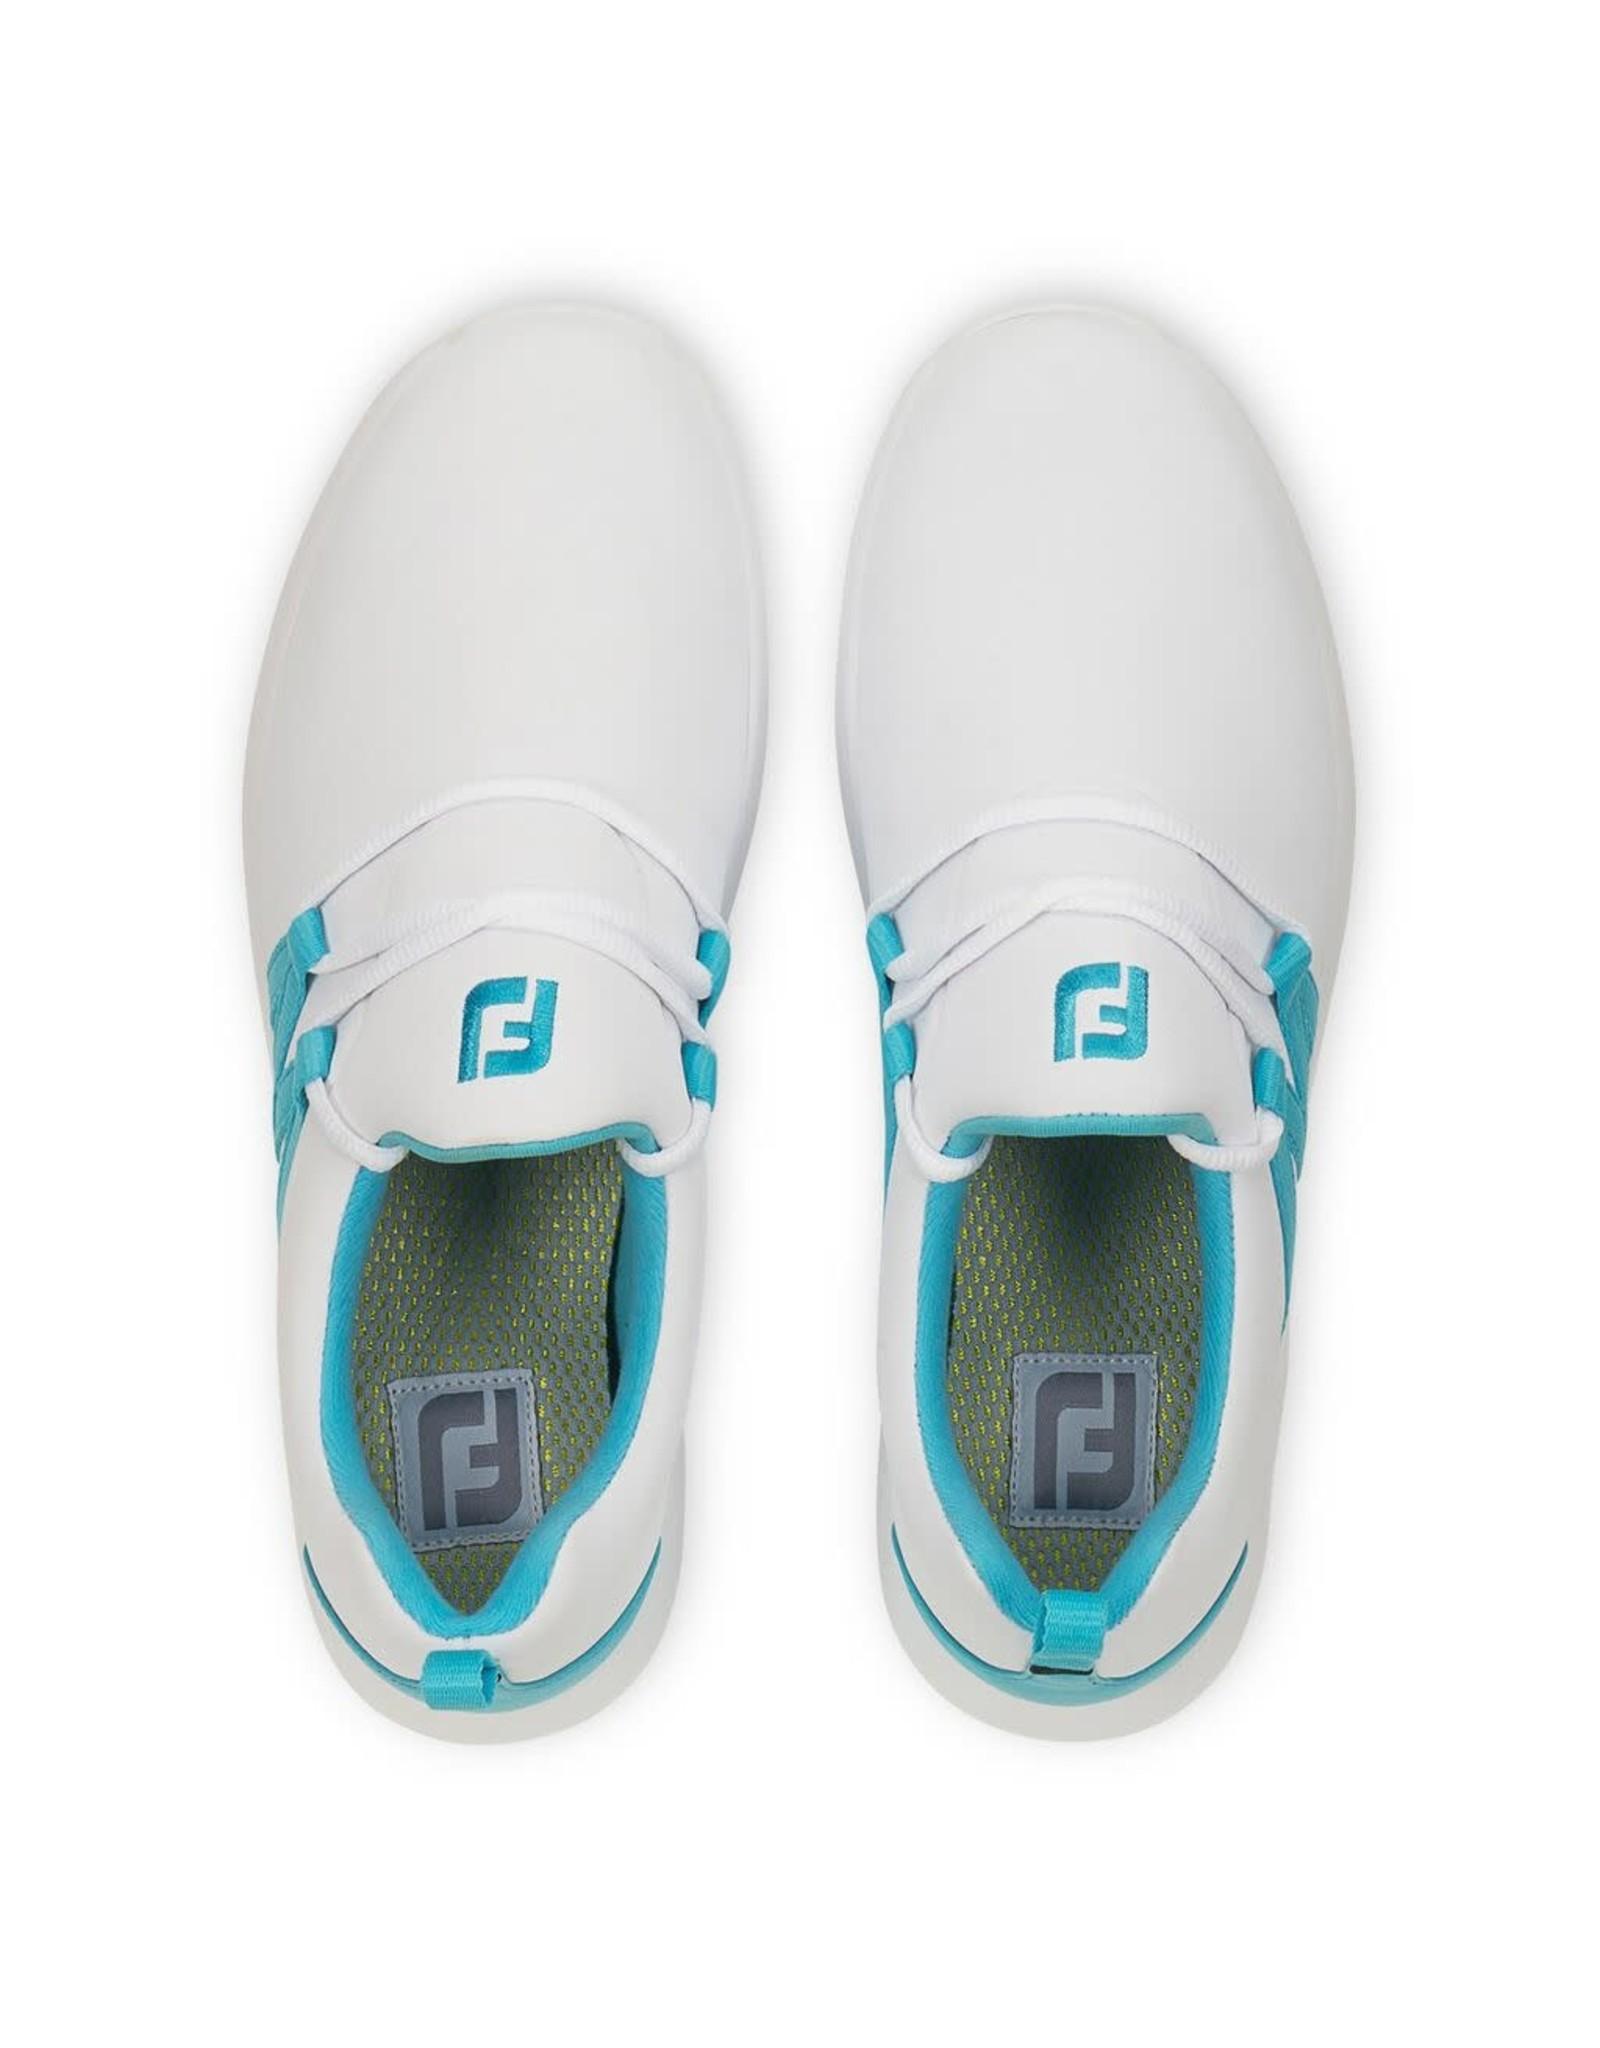 FJ FJ Leisure Slip-On White/Teal